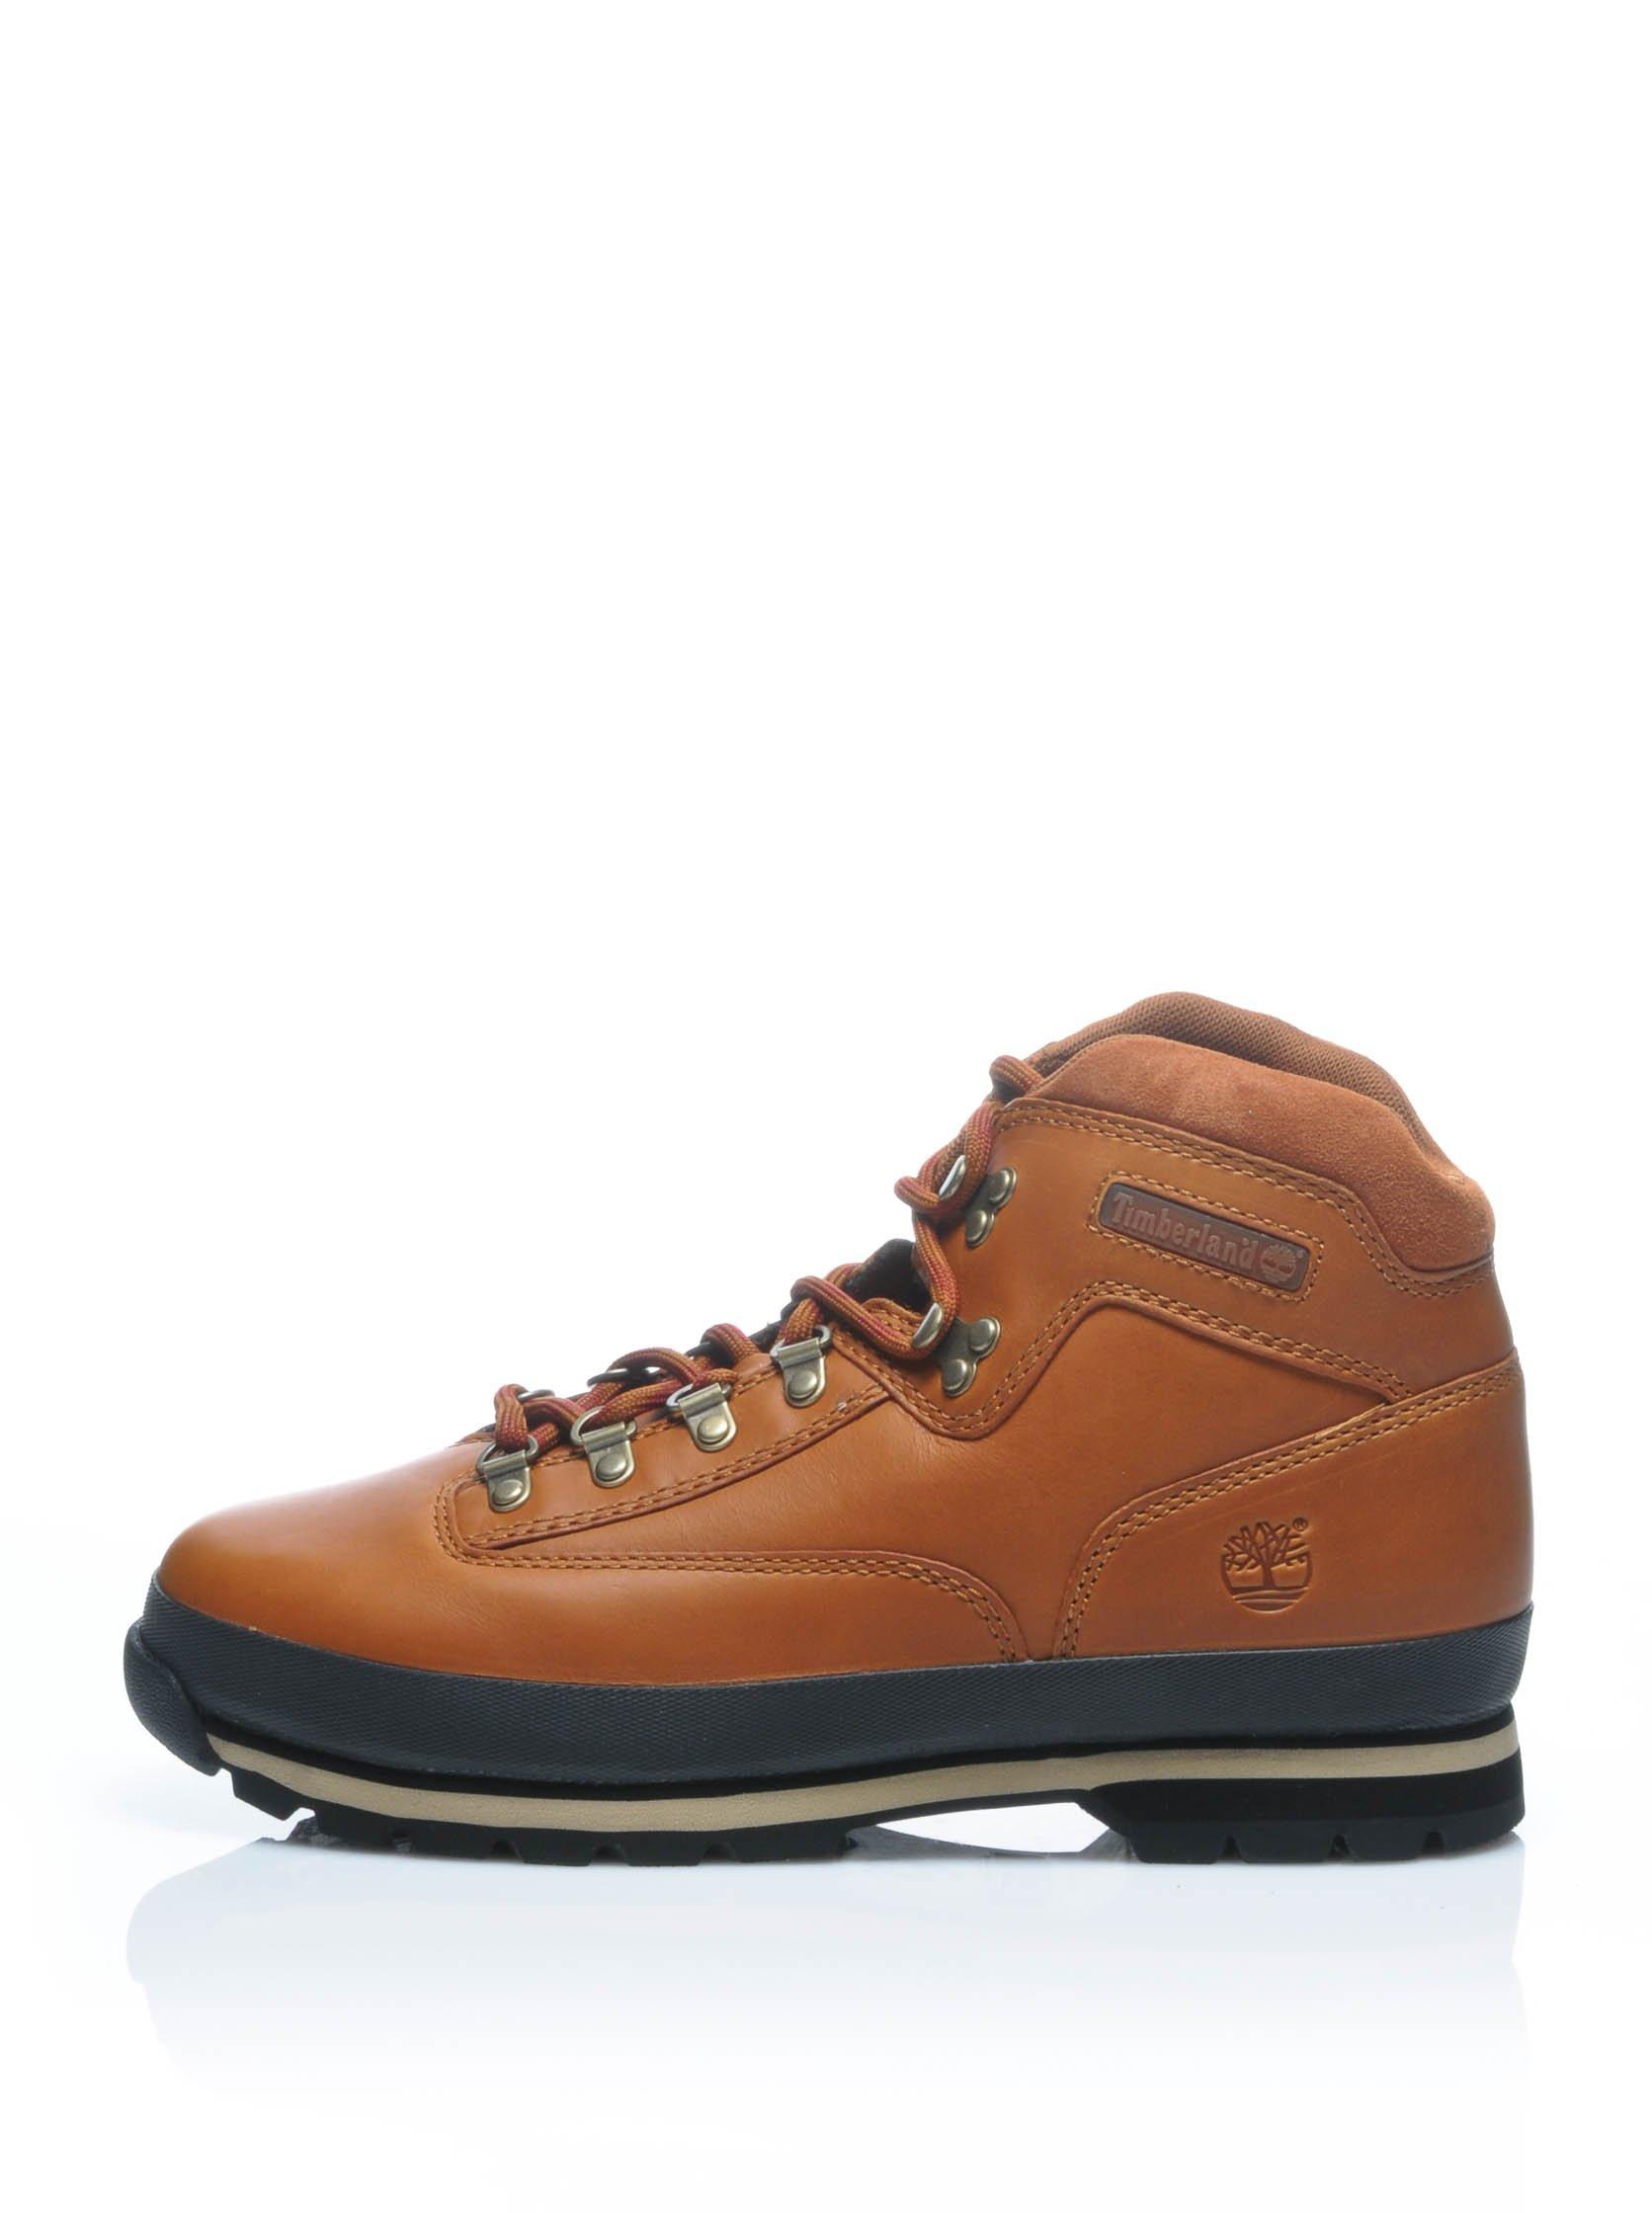 timberland mens eurohiker LTR MD BRN MEDI hi top boots 6602A sneakers (uk 7.5 us 8 eu 41.5)